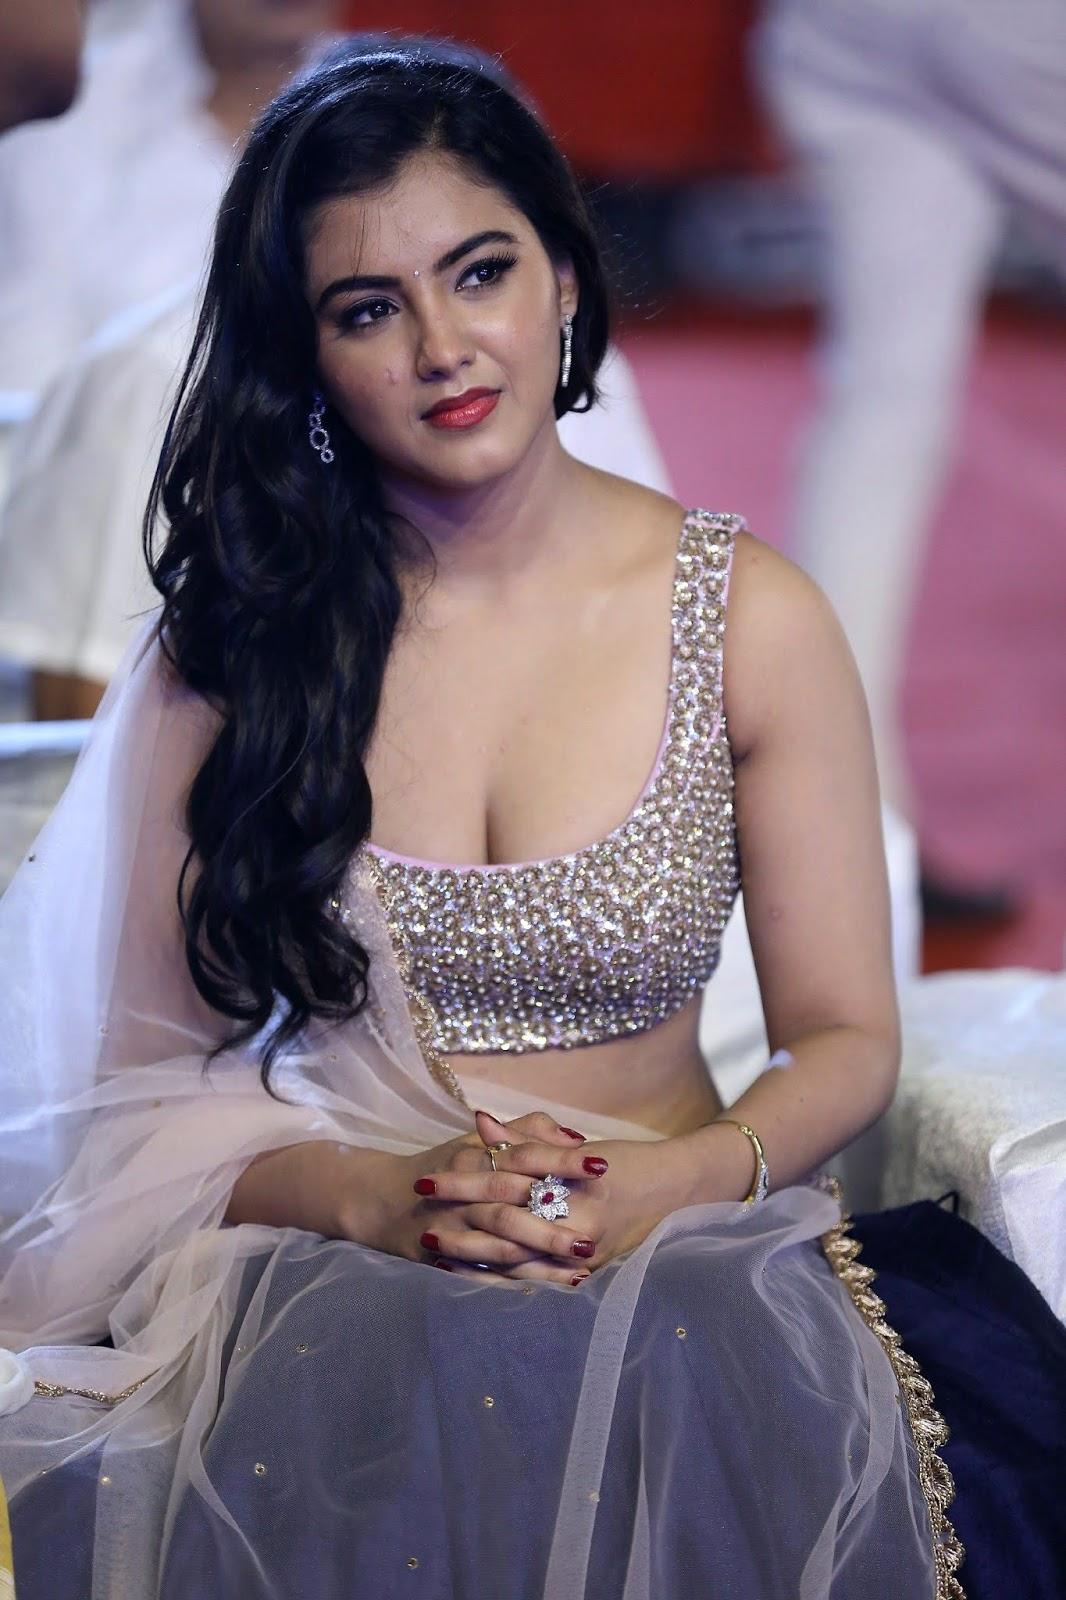 Malvika Sharma Looks stunning in a glittering backless Golden Choli and Ghagra